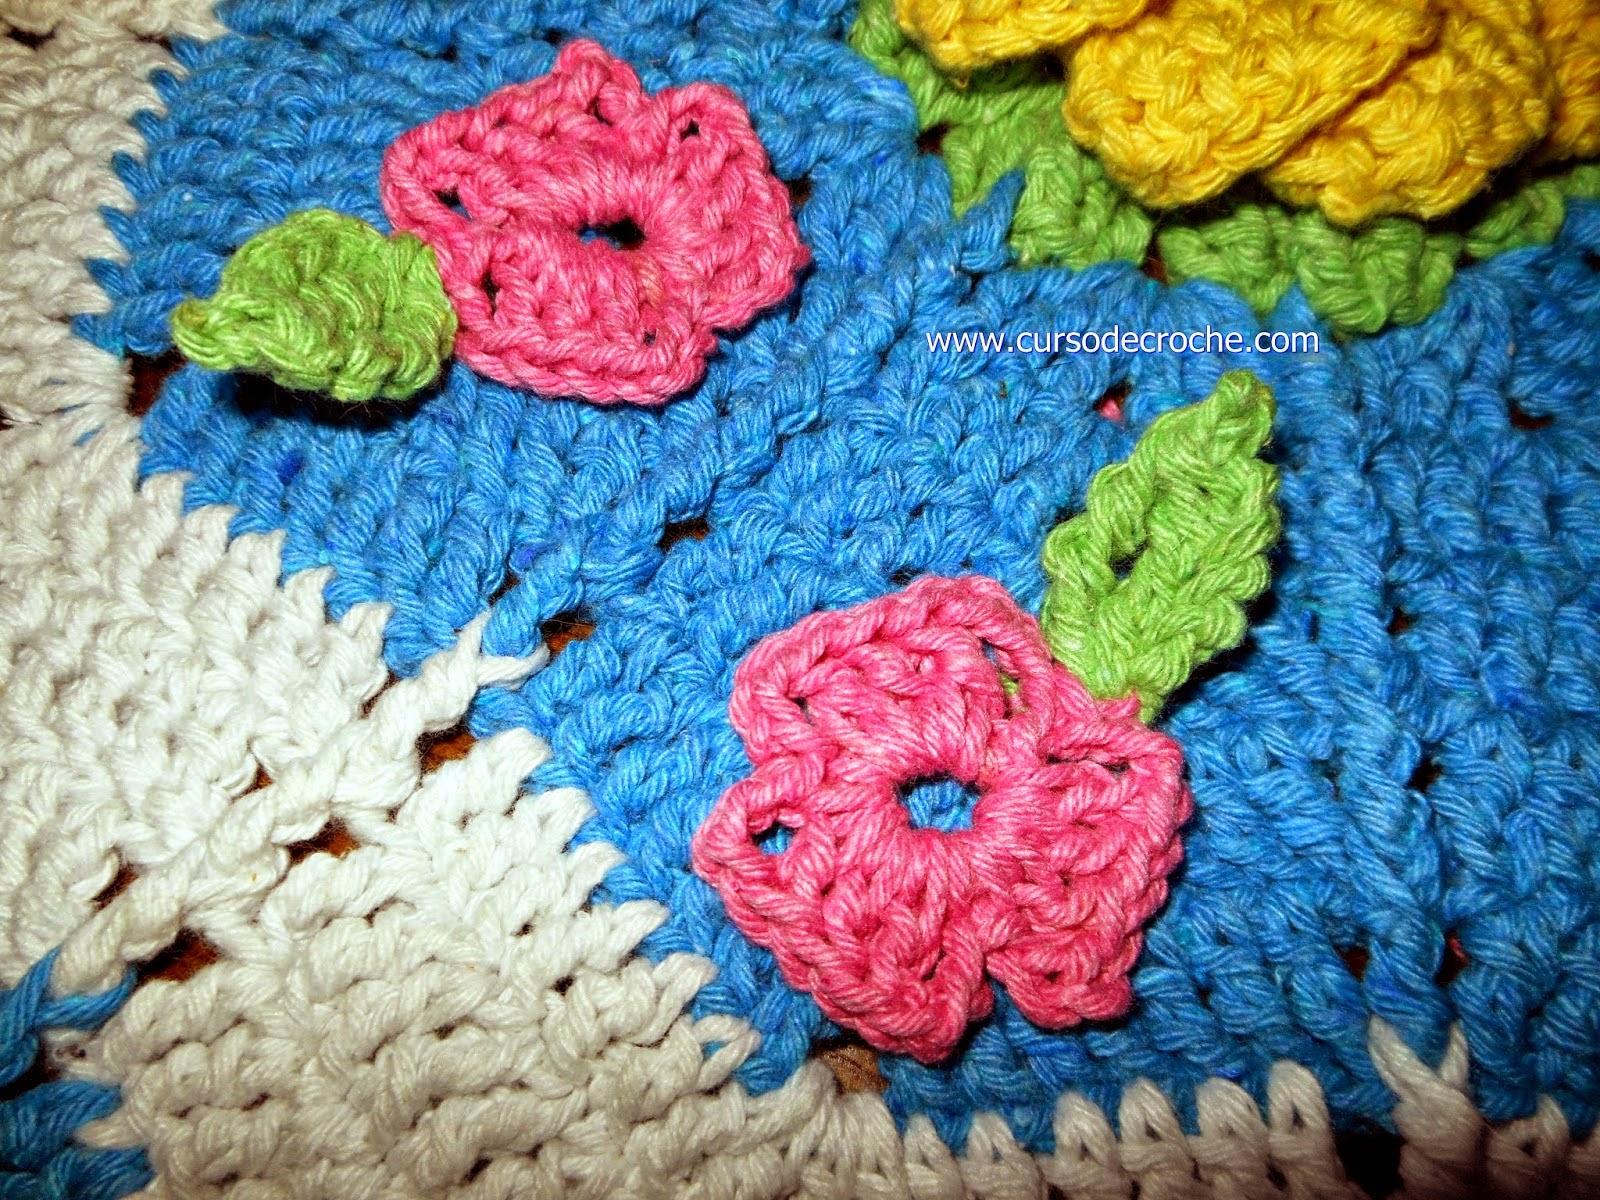 tapete de croche com flores tapete de croche listrado como fazer tapete de croche edinir-croche aprender croche curso de croche facebook